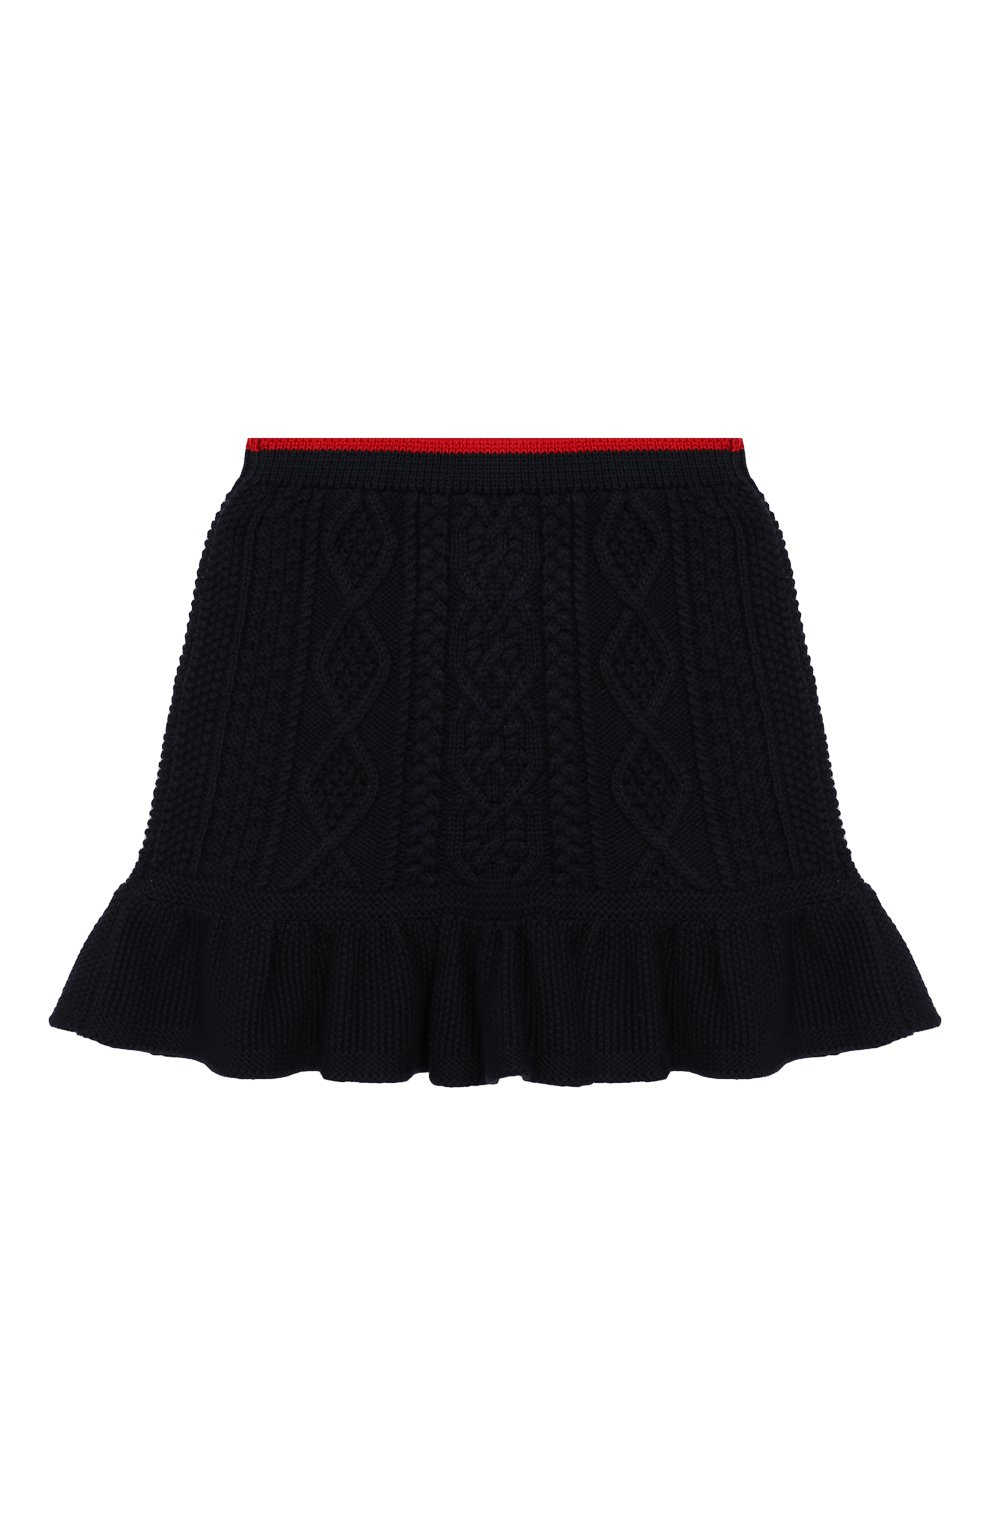 Детский комплект из юбки и топа POLO RALPH LAUREN синего цвета, арт. 313736827 | Фото 5